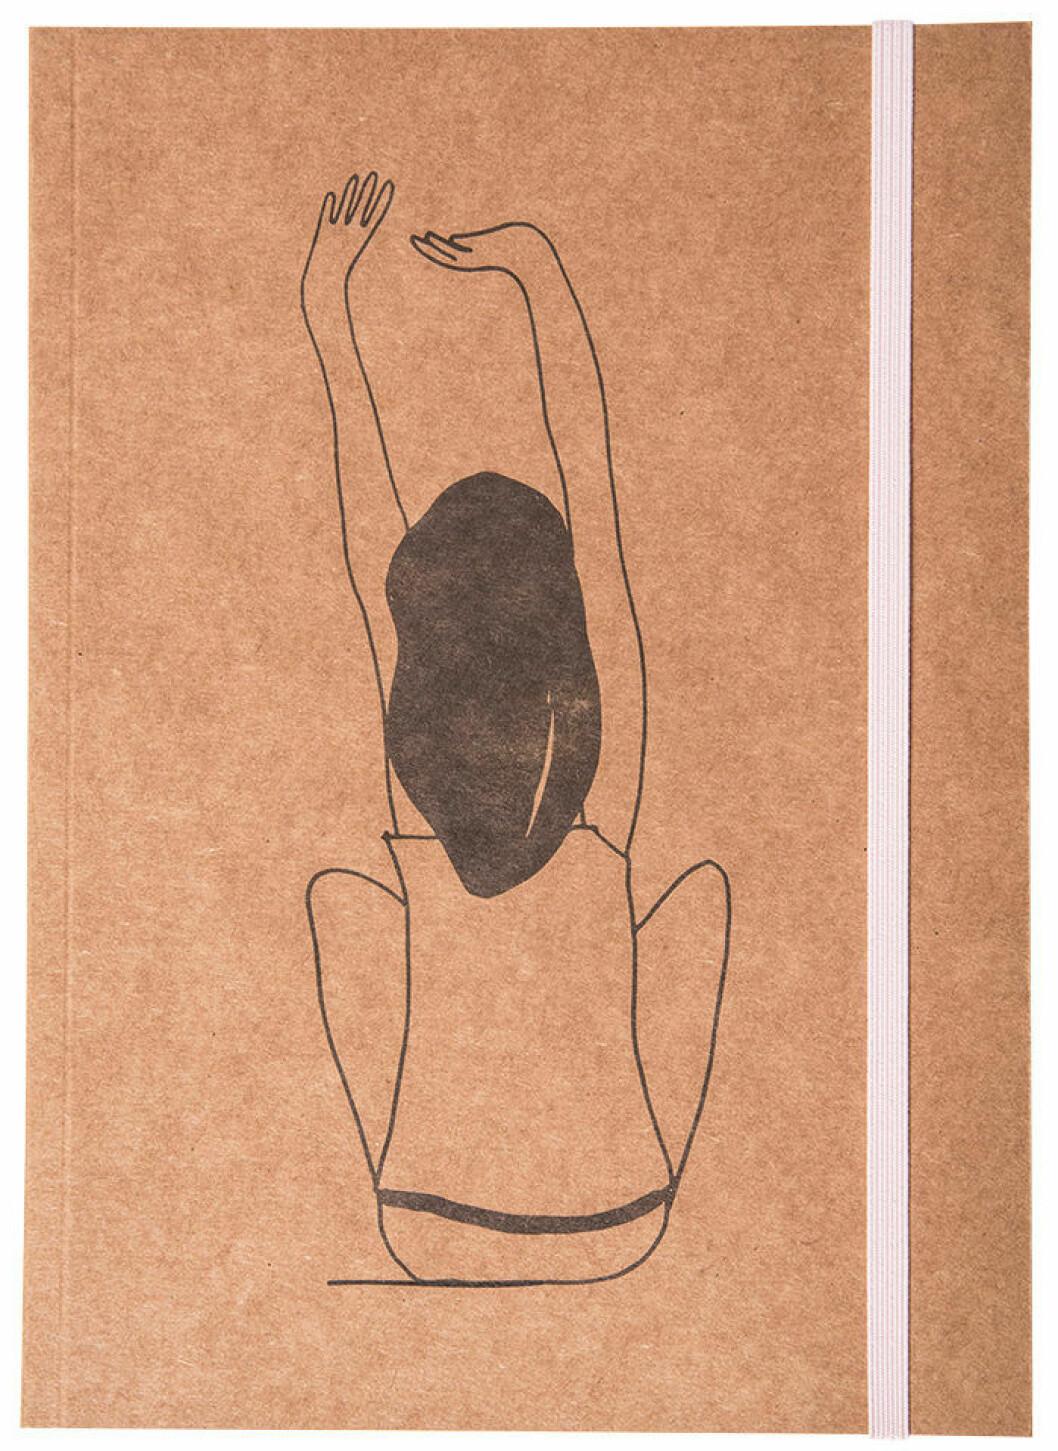 anteckningsbok från Therese Lindgren + Lagerhaus-kollektionen